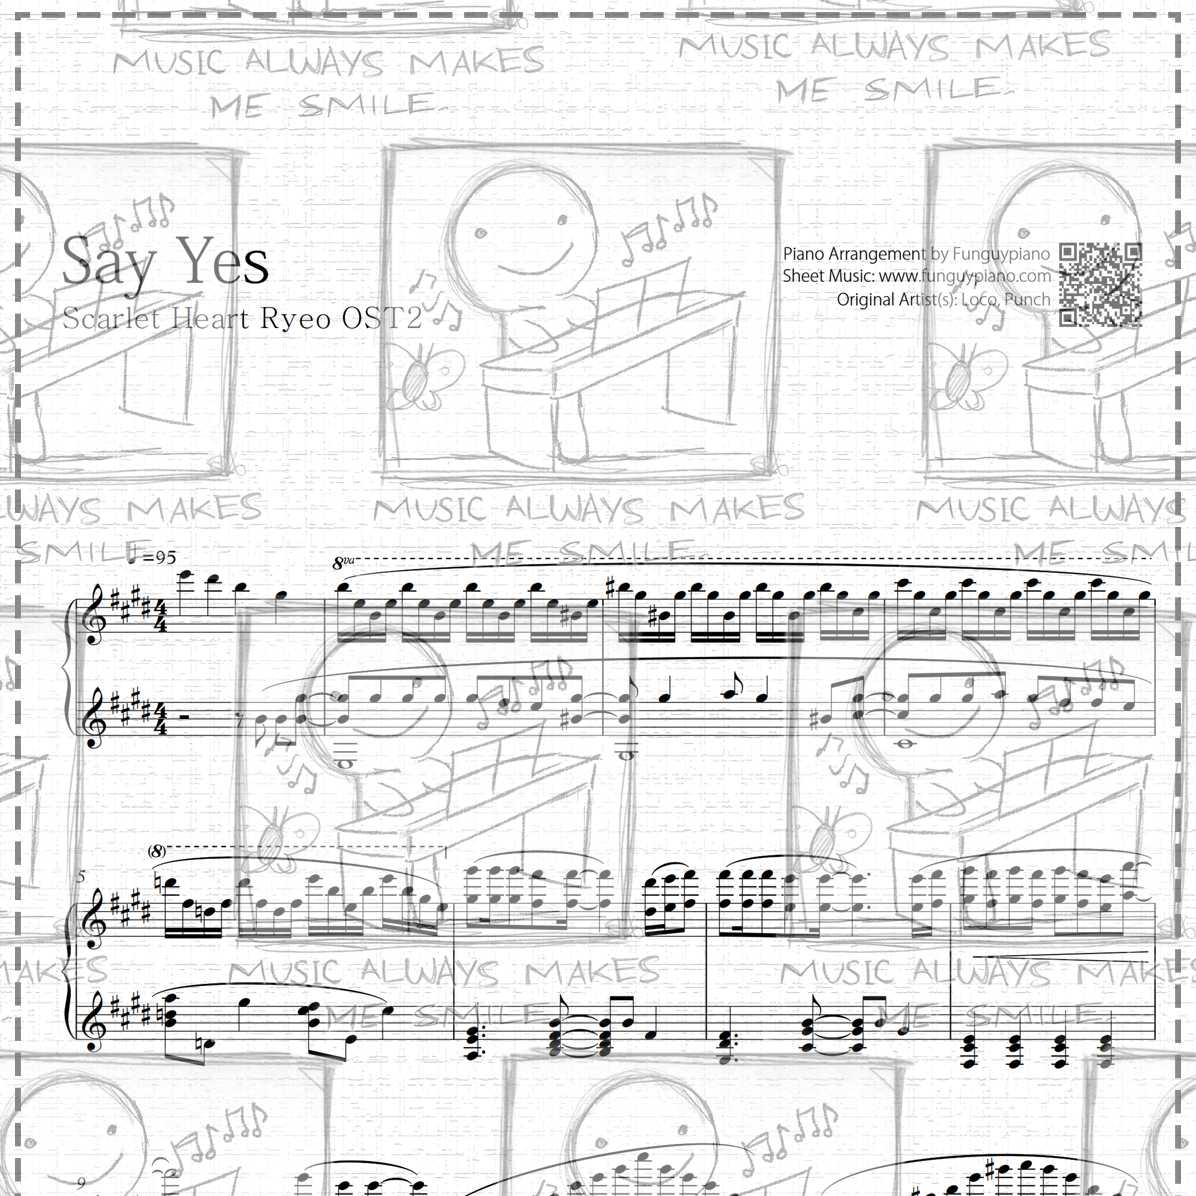 Say Yes [ Sheet Music / Midi